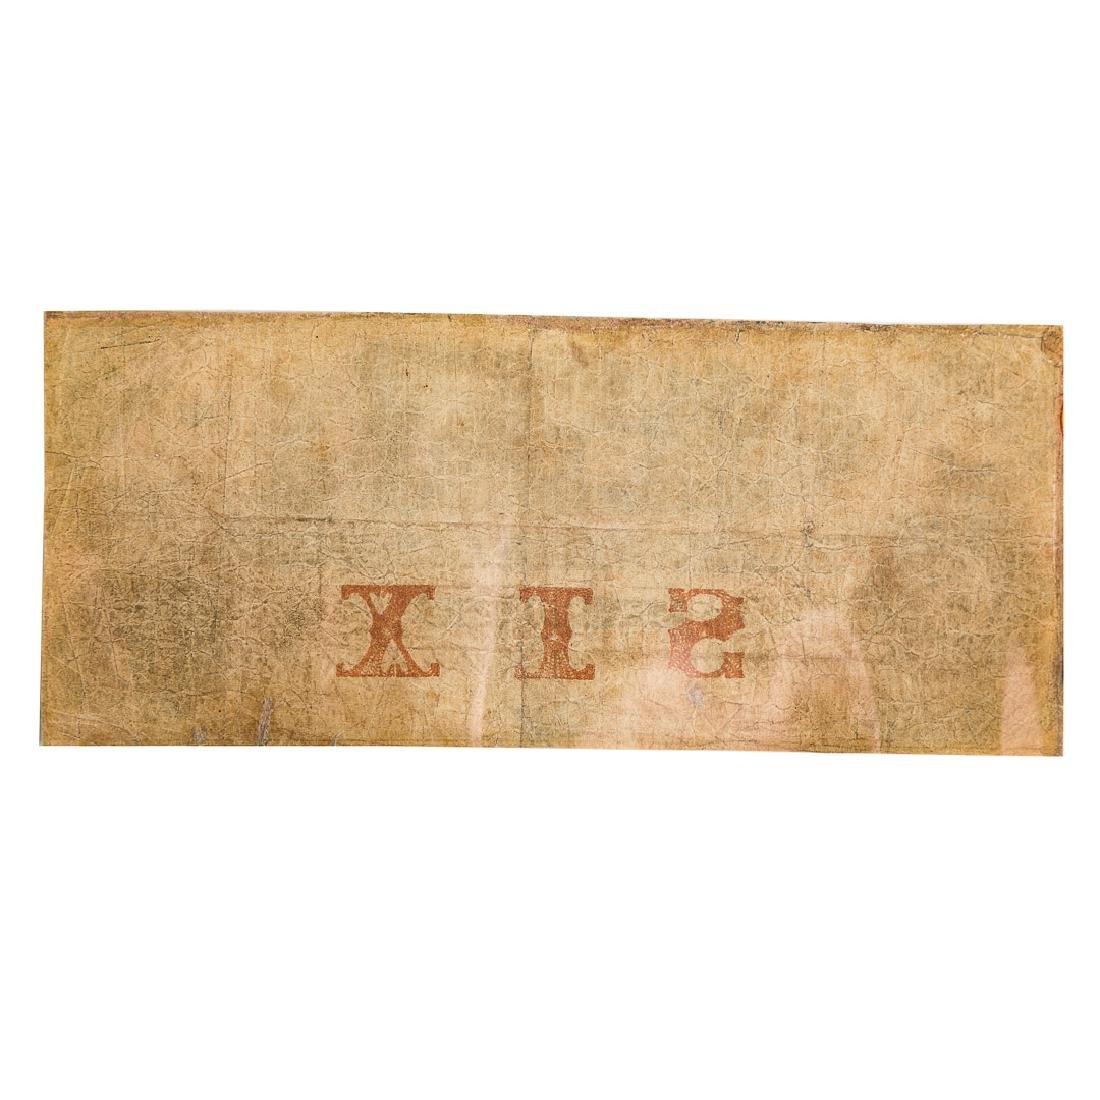 [US] $6 Bank of Wilmington,NC Sept 10 1855 Fine - 2